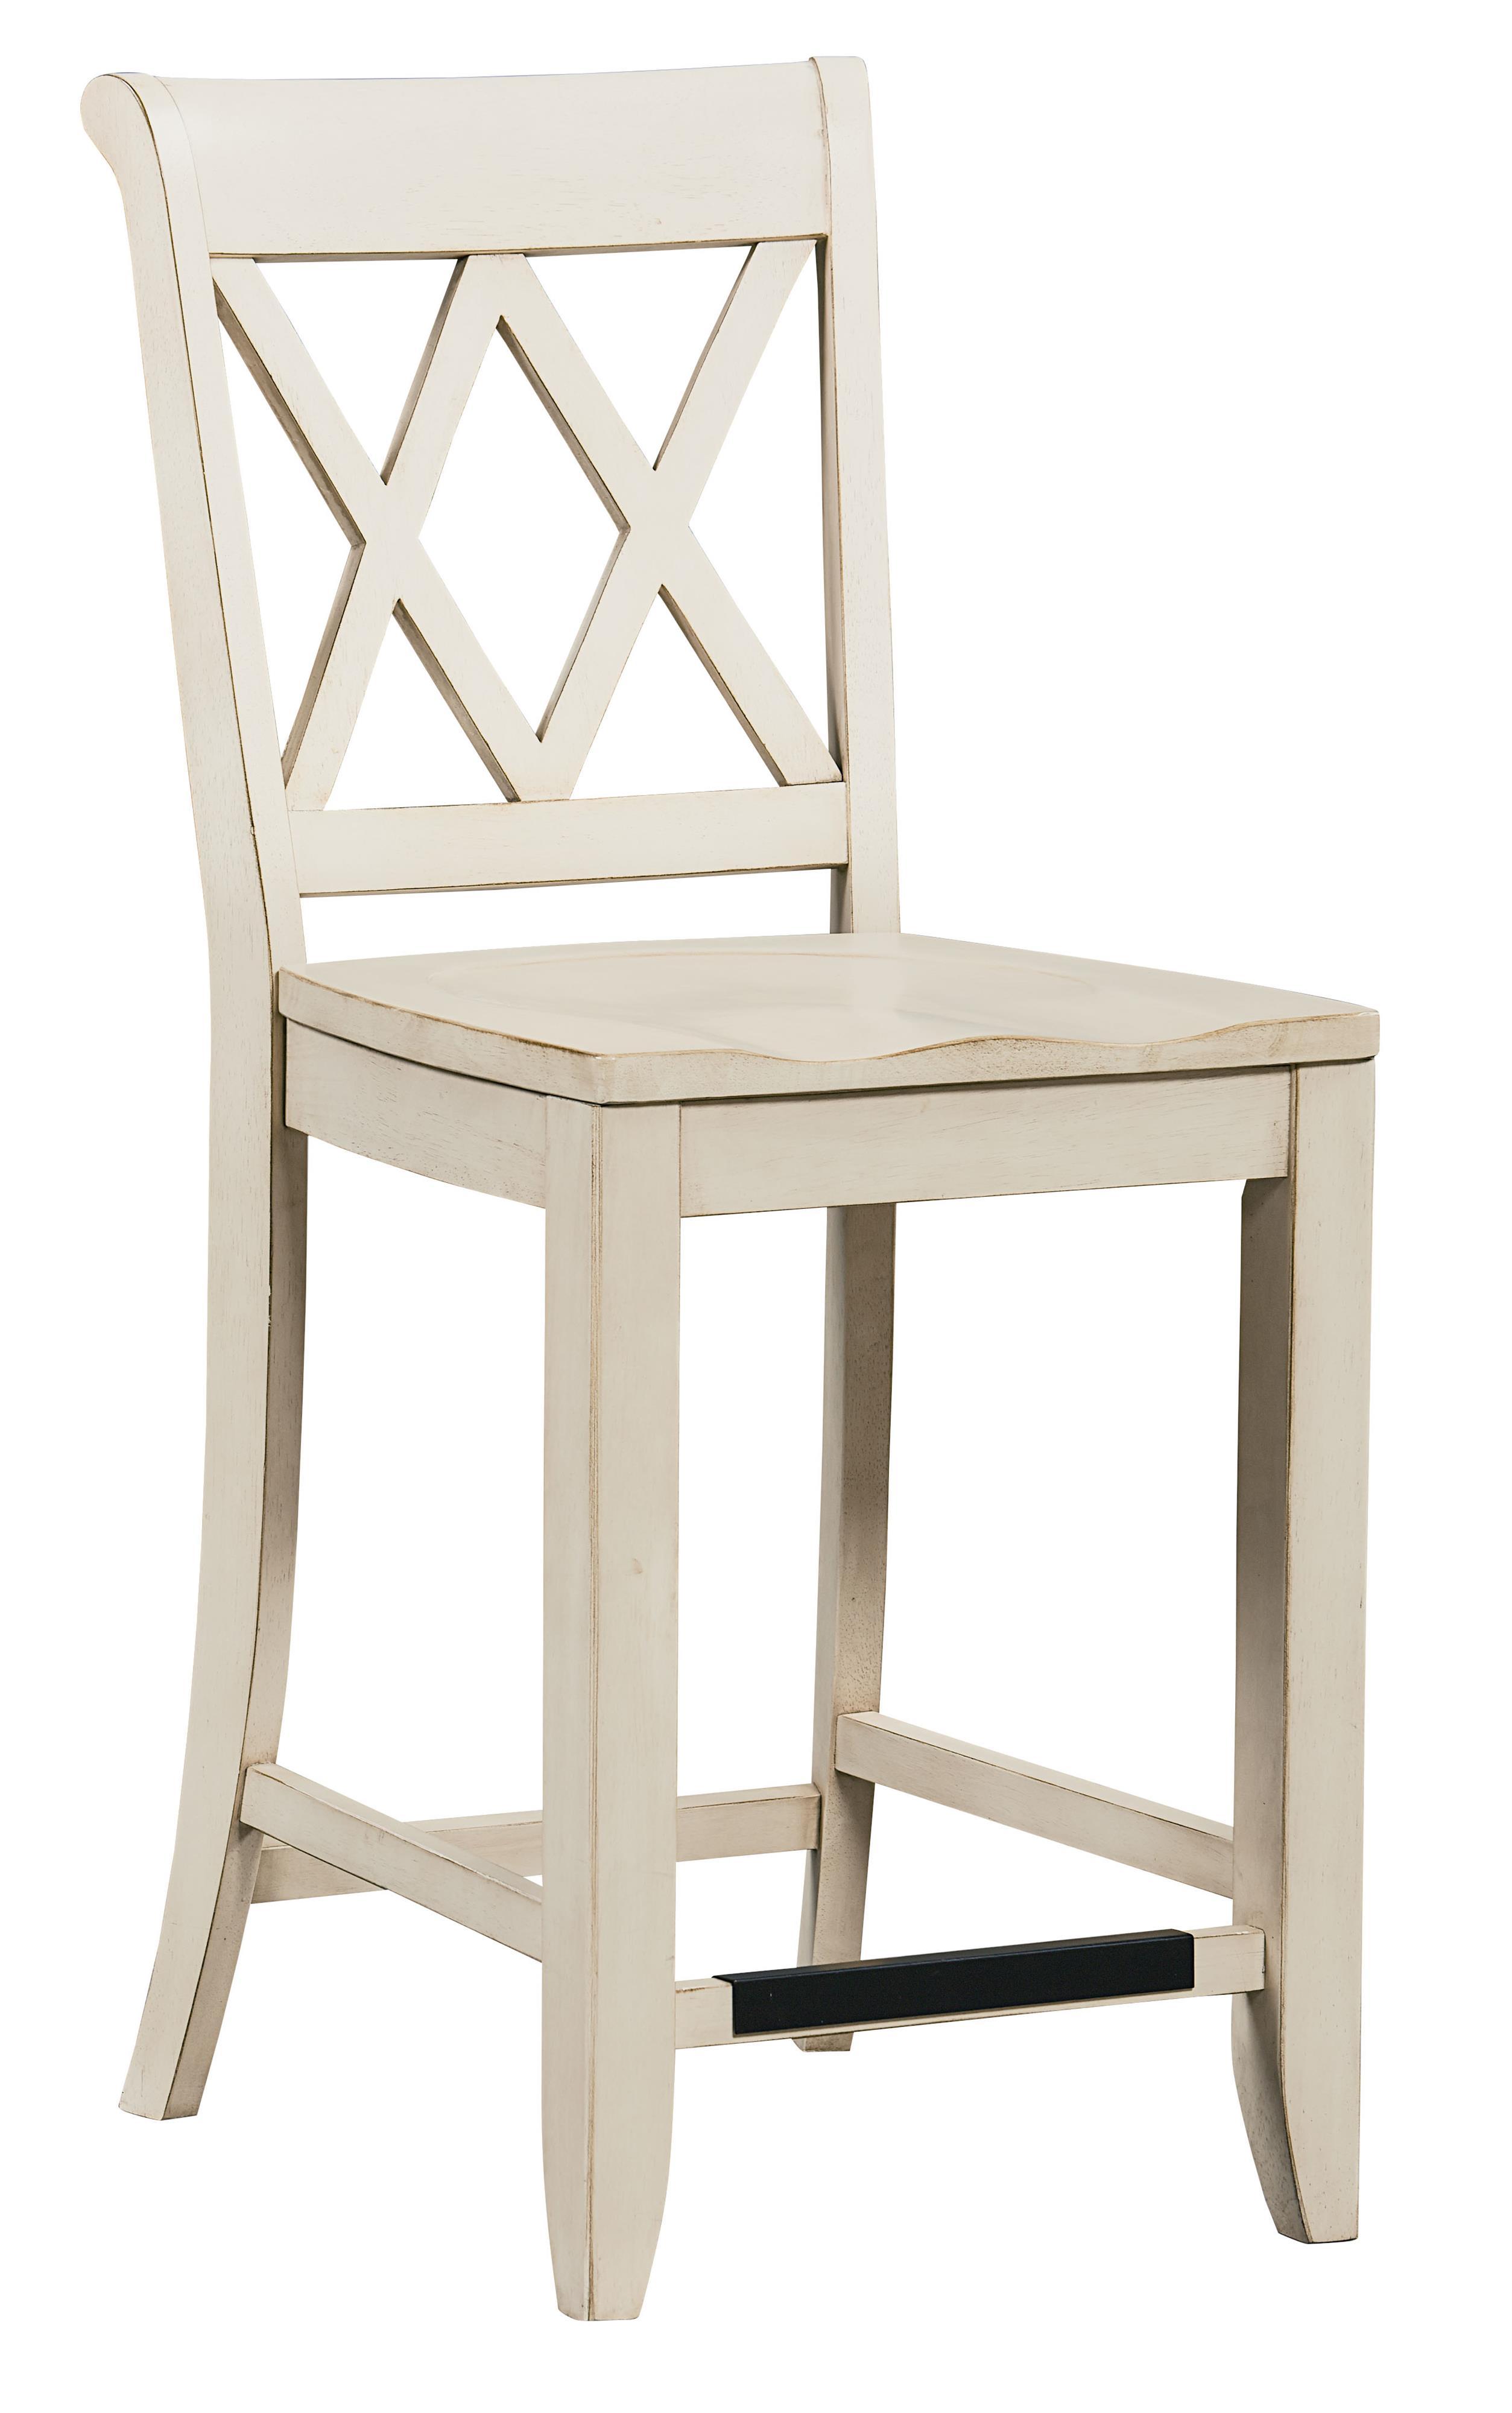 Standard Furniture Vintage 11324 Vanilla Counter Height